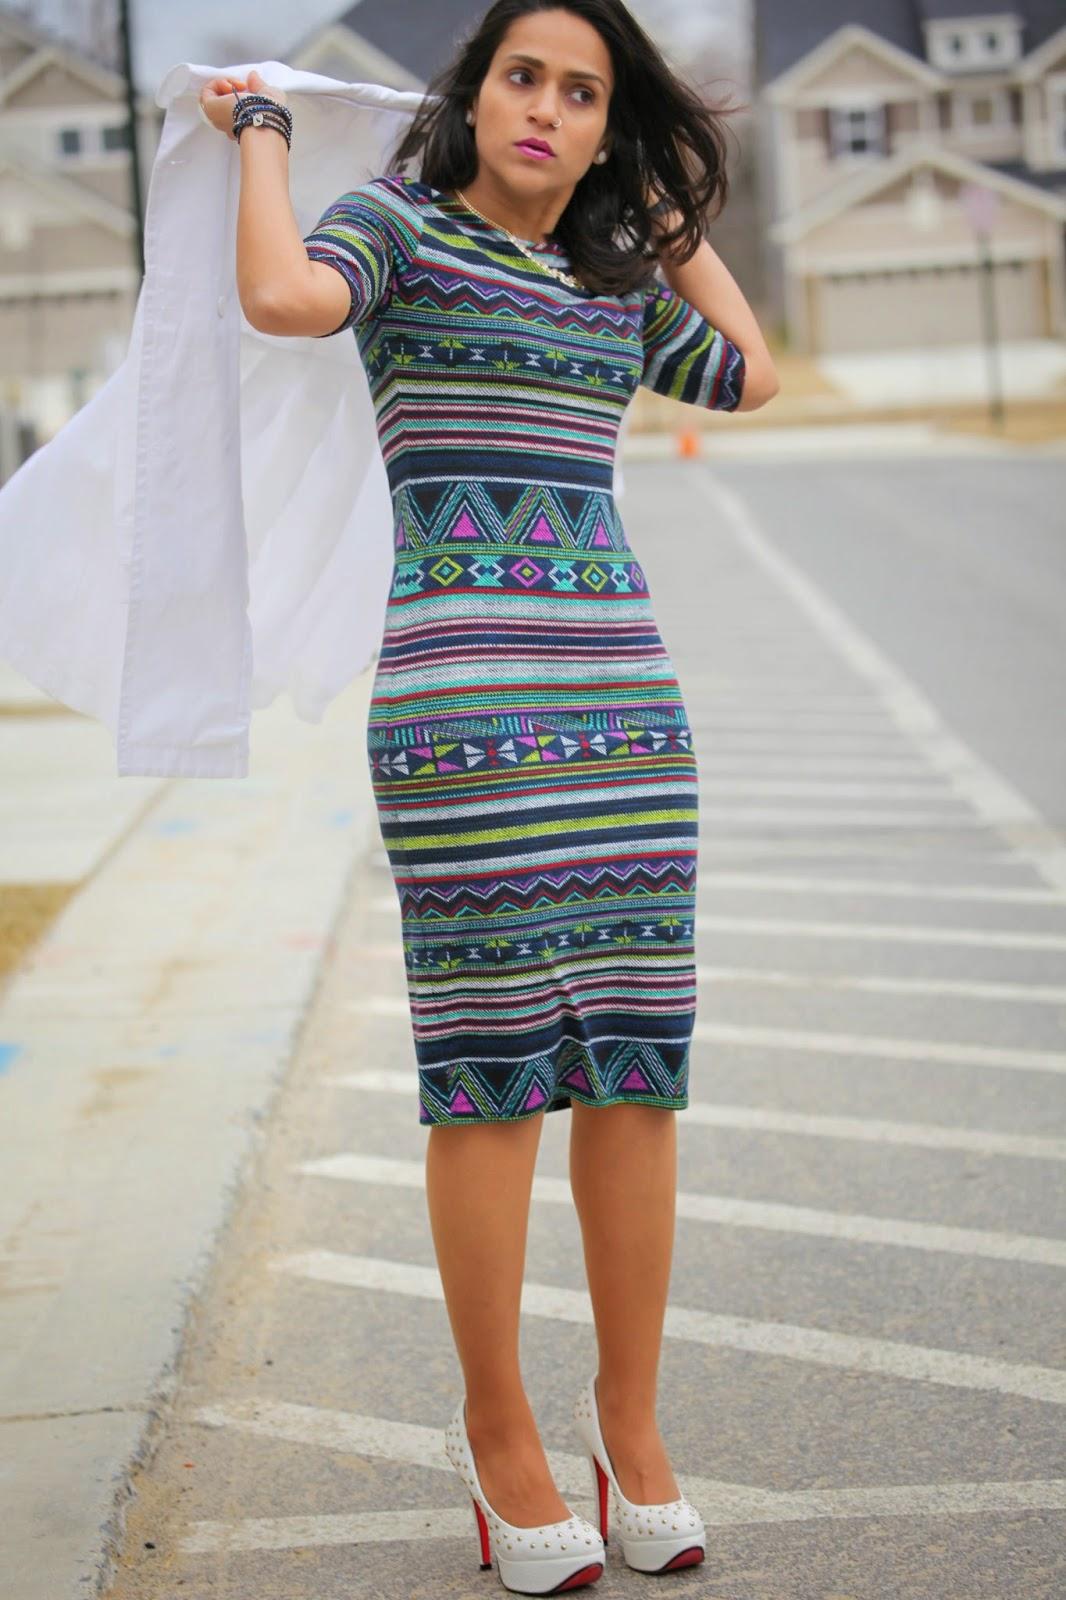 Dress  - Target  Shoes - Rare Jacket - Armani Jewelry - Rocksbox Tanvii.com